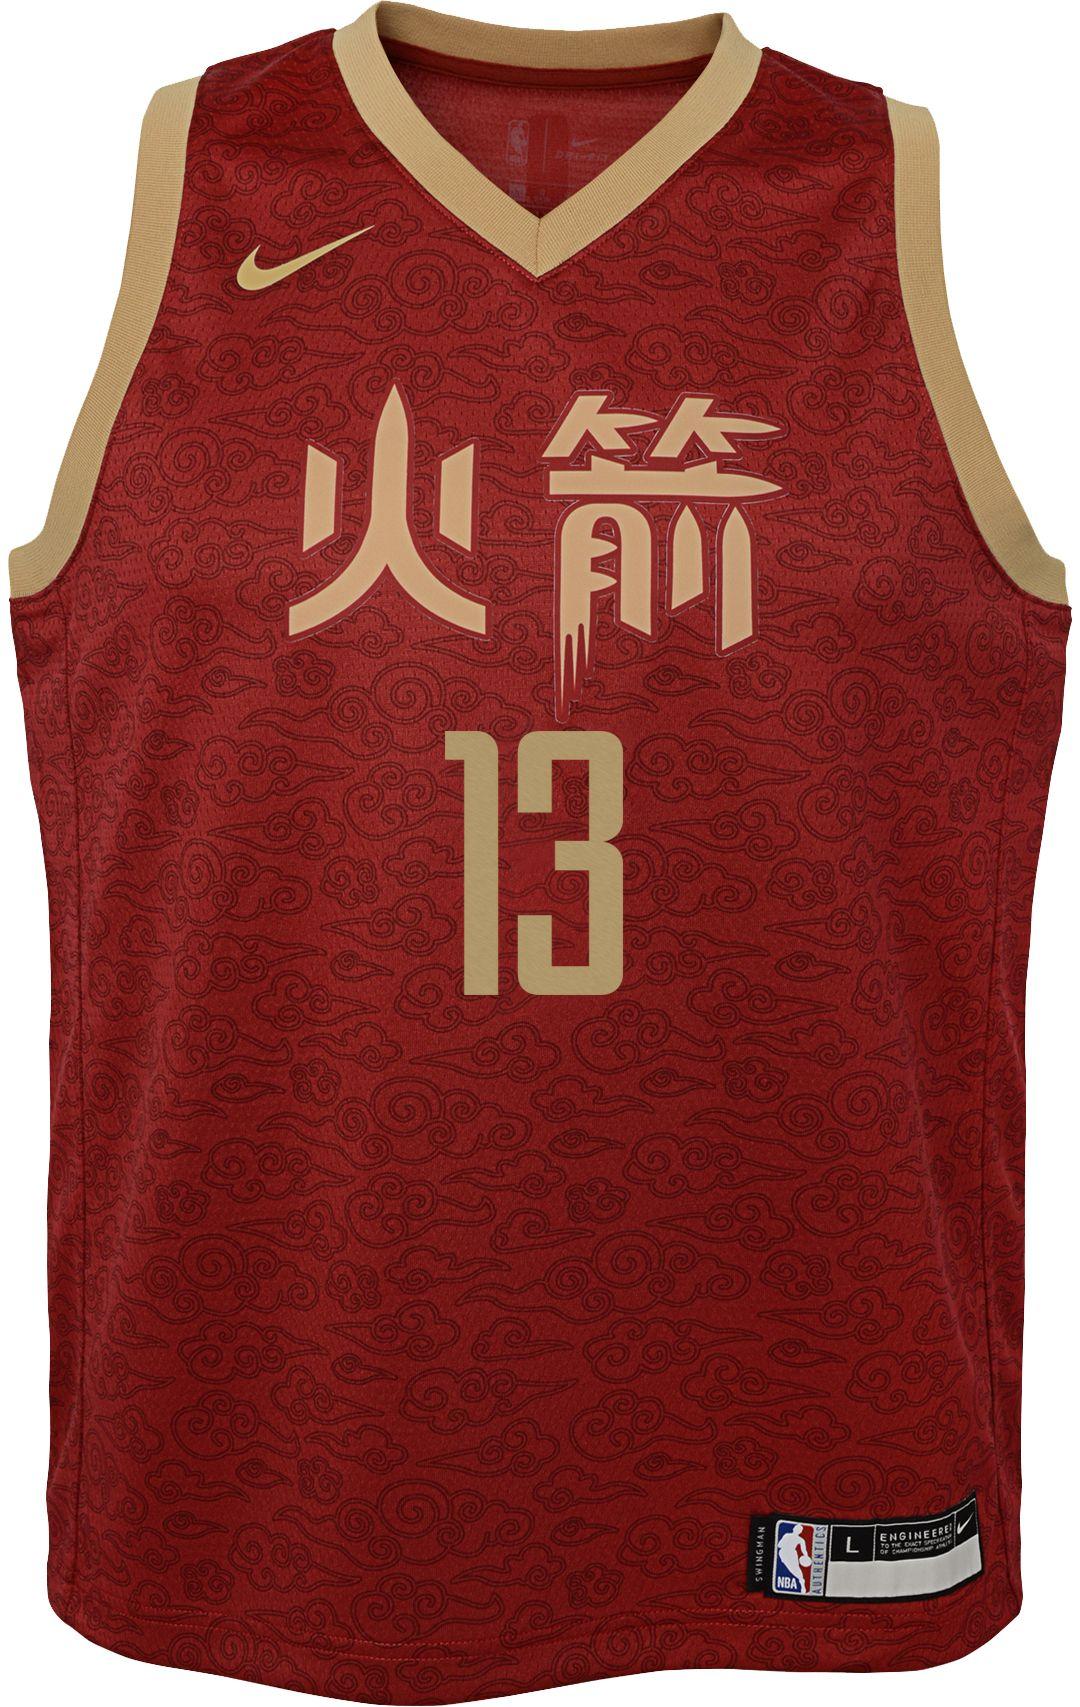 c5fd80888 Nike Youth Houston Rockets James Harden Dri-FIT City Edition Swingman Jersey.  noImageFound. Previous. 1. 2